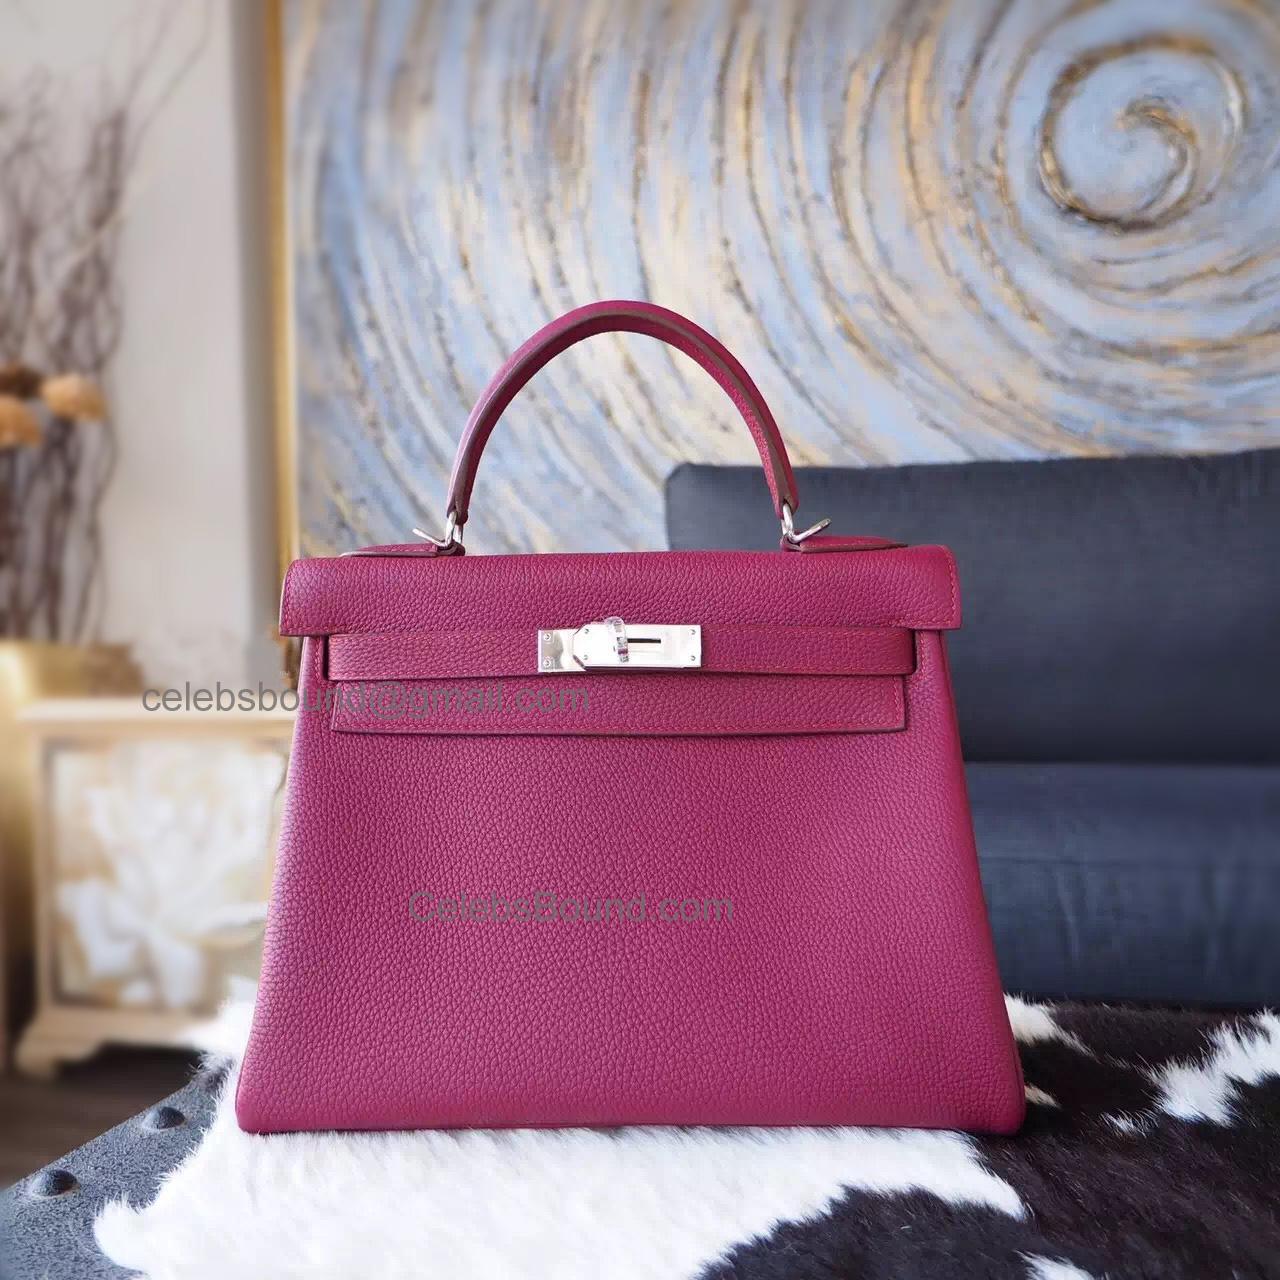 9e68a4f1189 Replica Hermes Kelly 28 Handmade Bag in k5 Tosca Togo Calfskin SHW